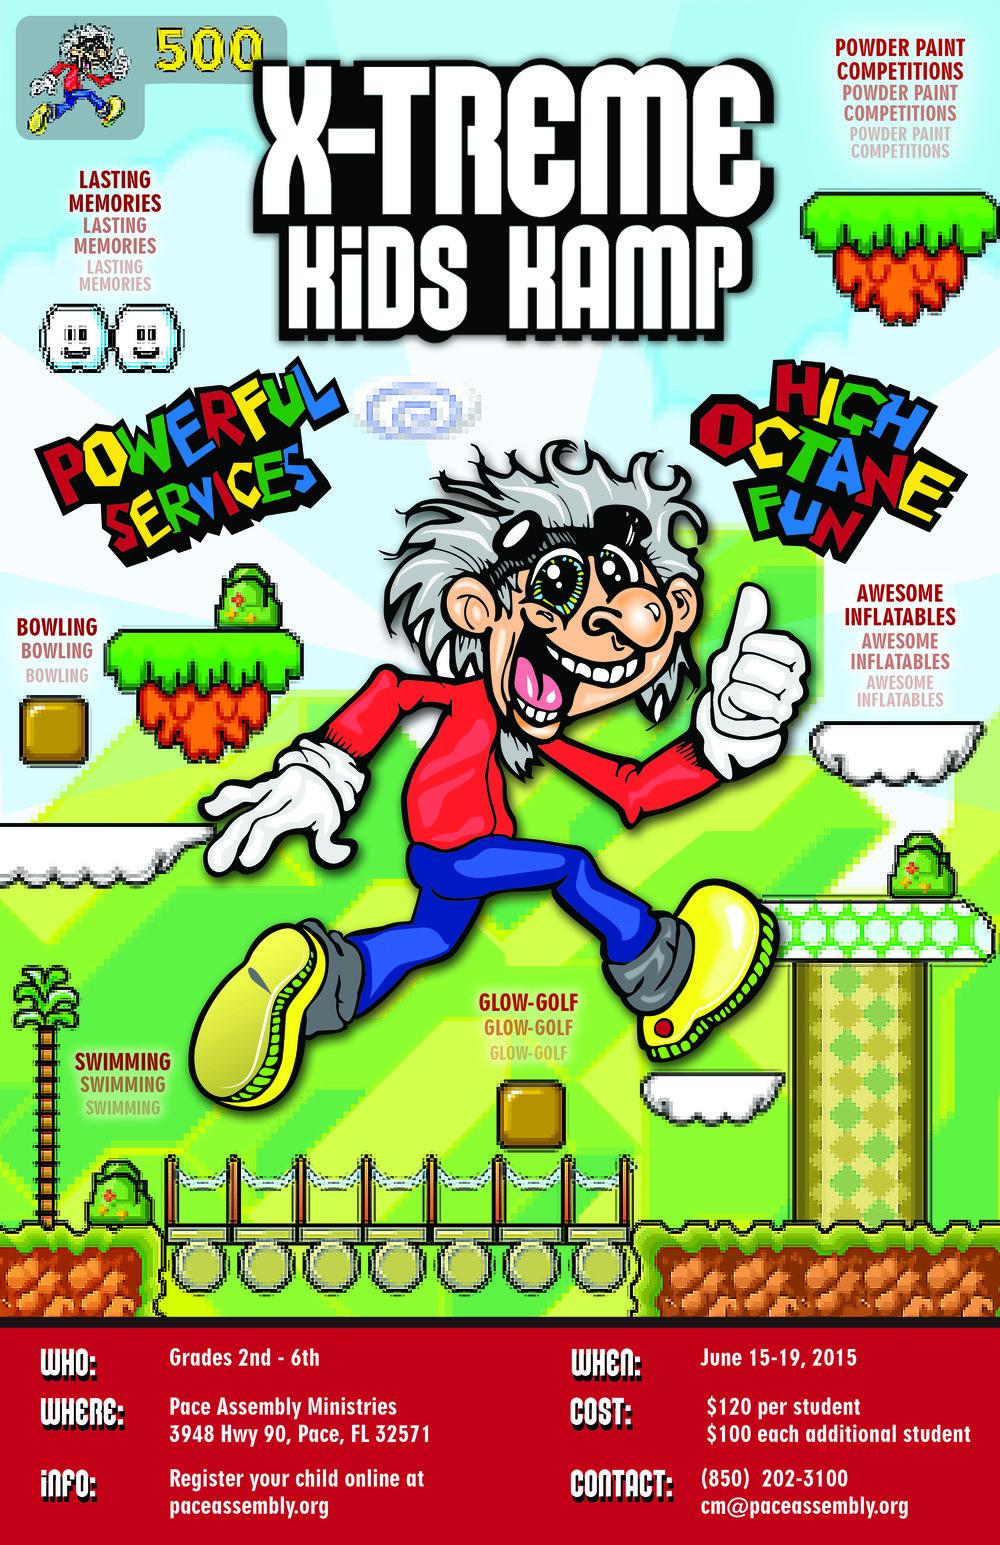 Kids-Kamp-Flyer-Front-FINAL.jpg